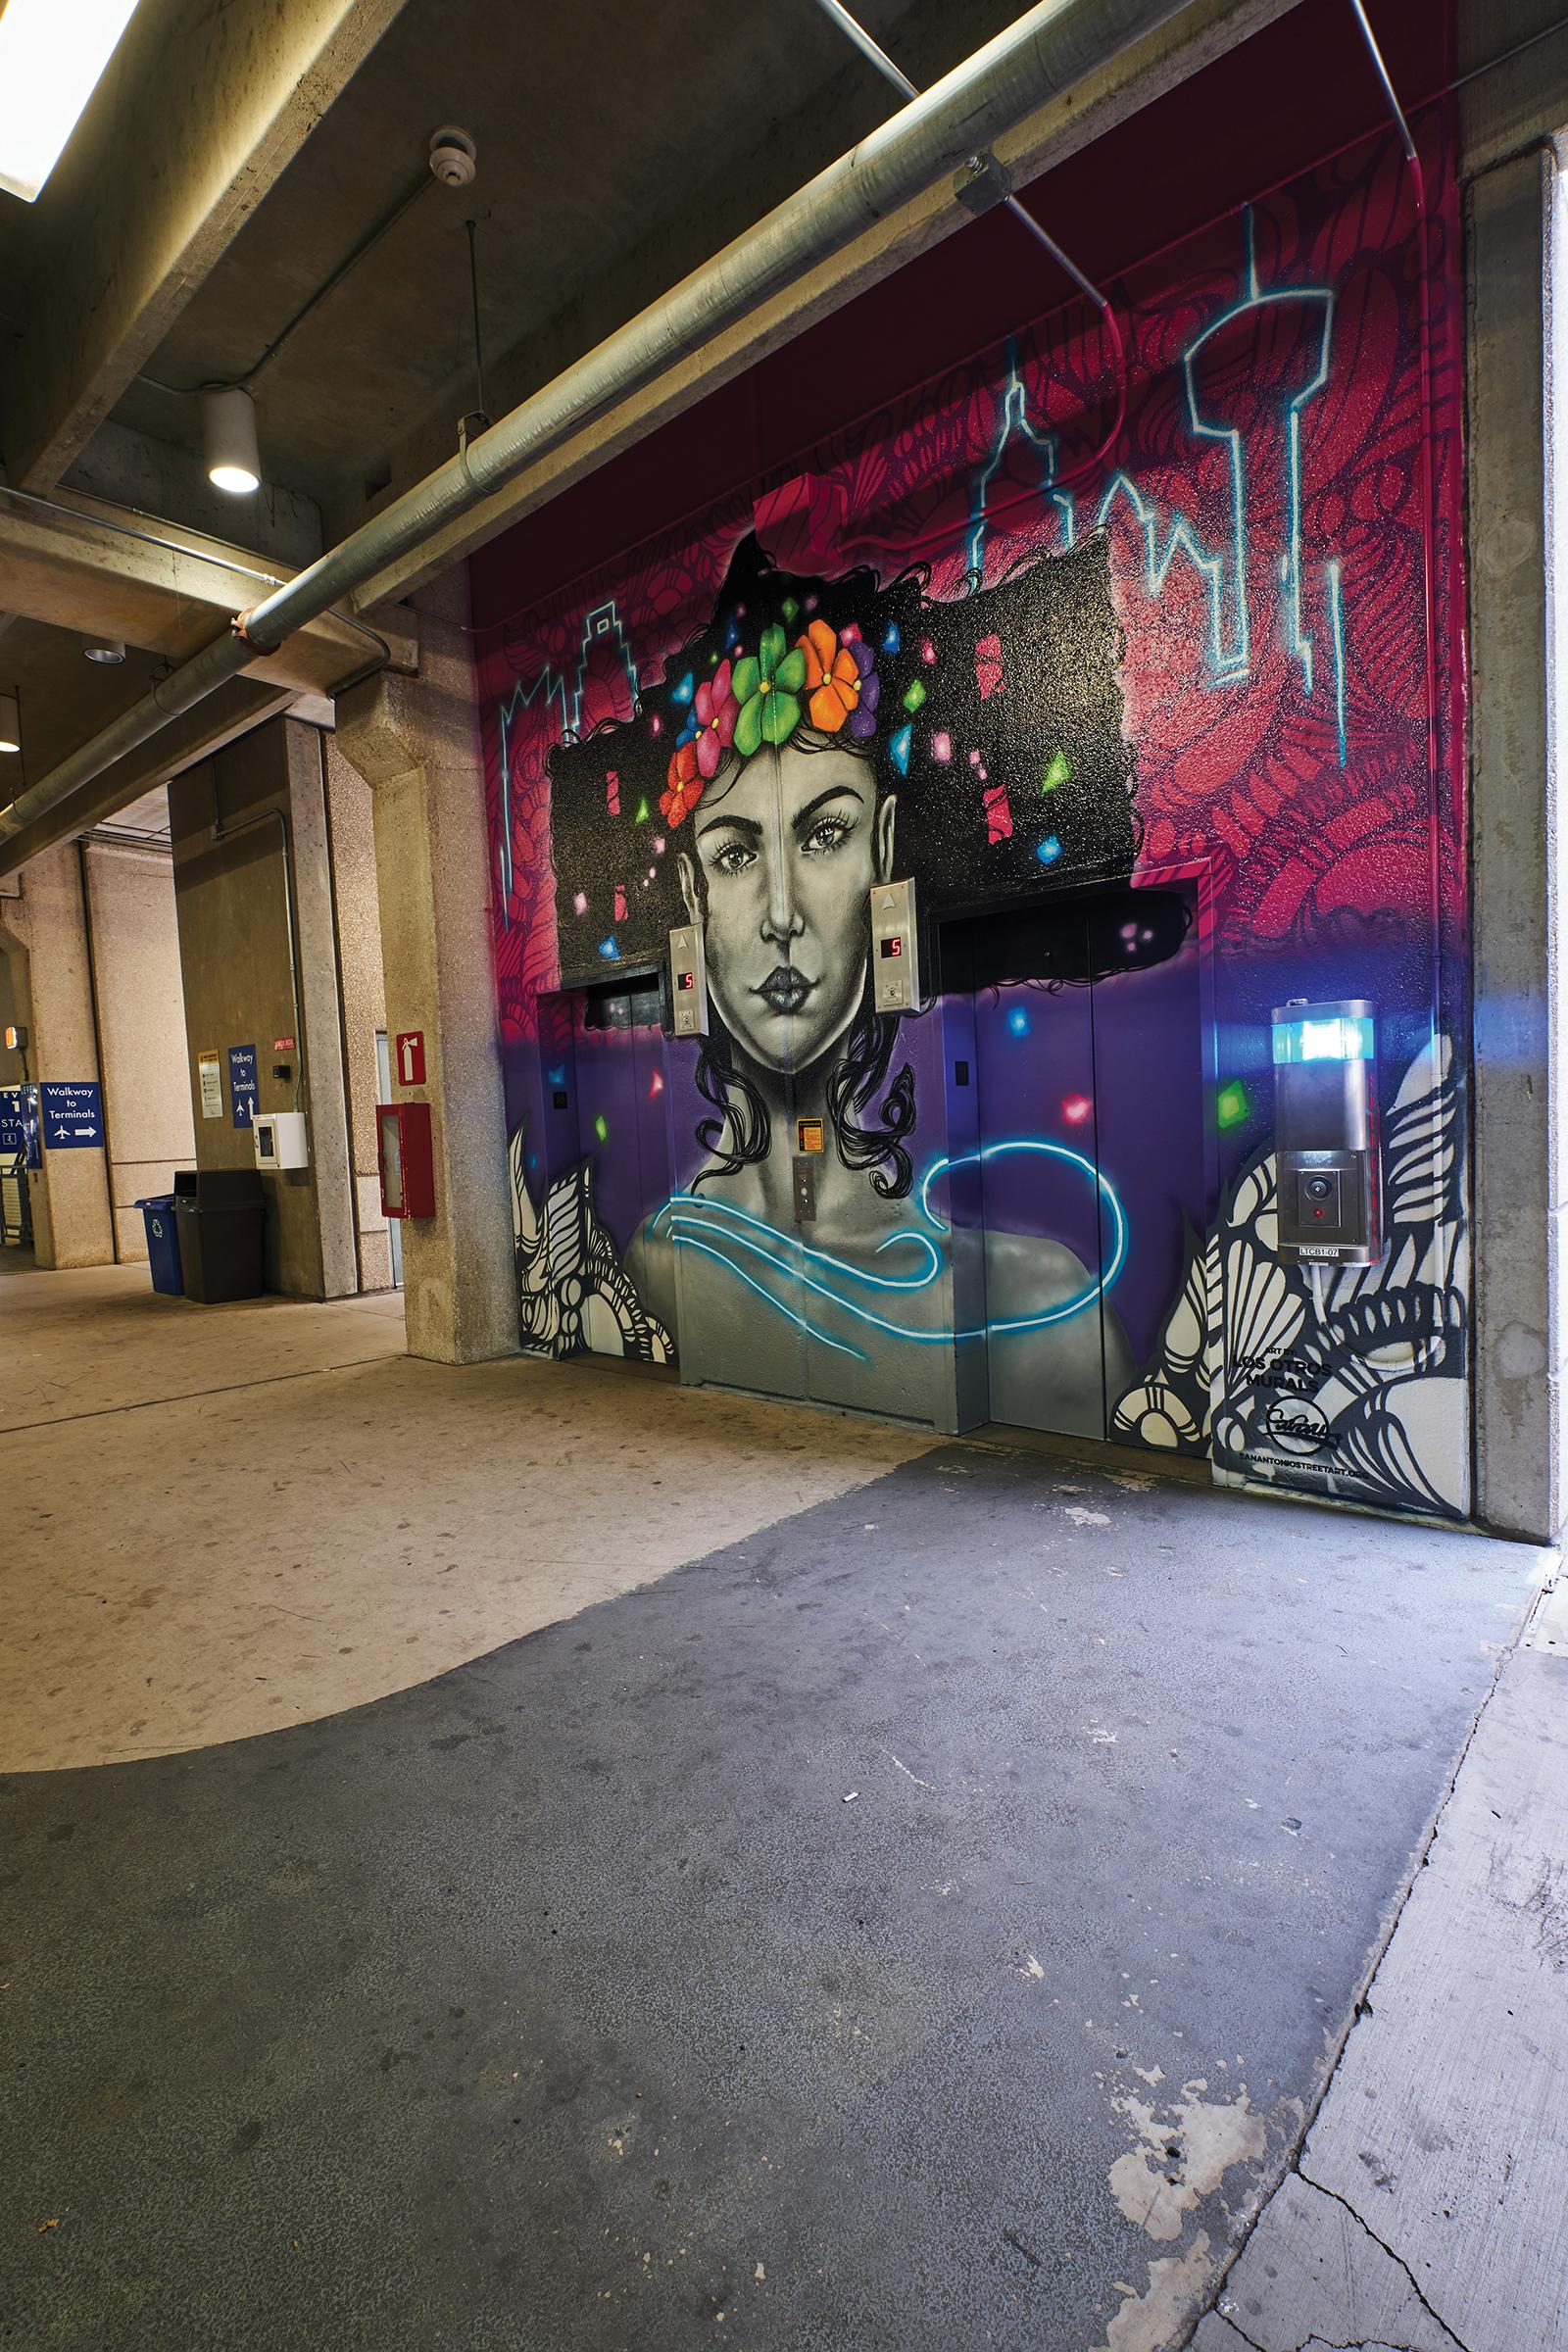 San Antonio airport parking garage mural